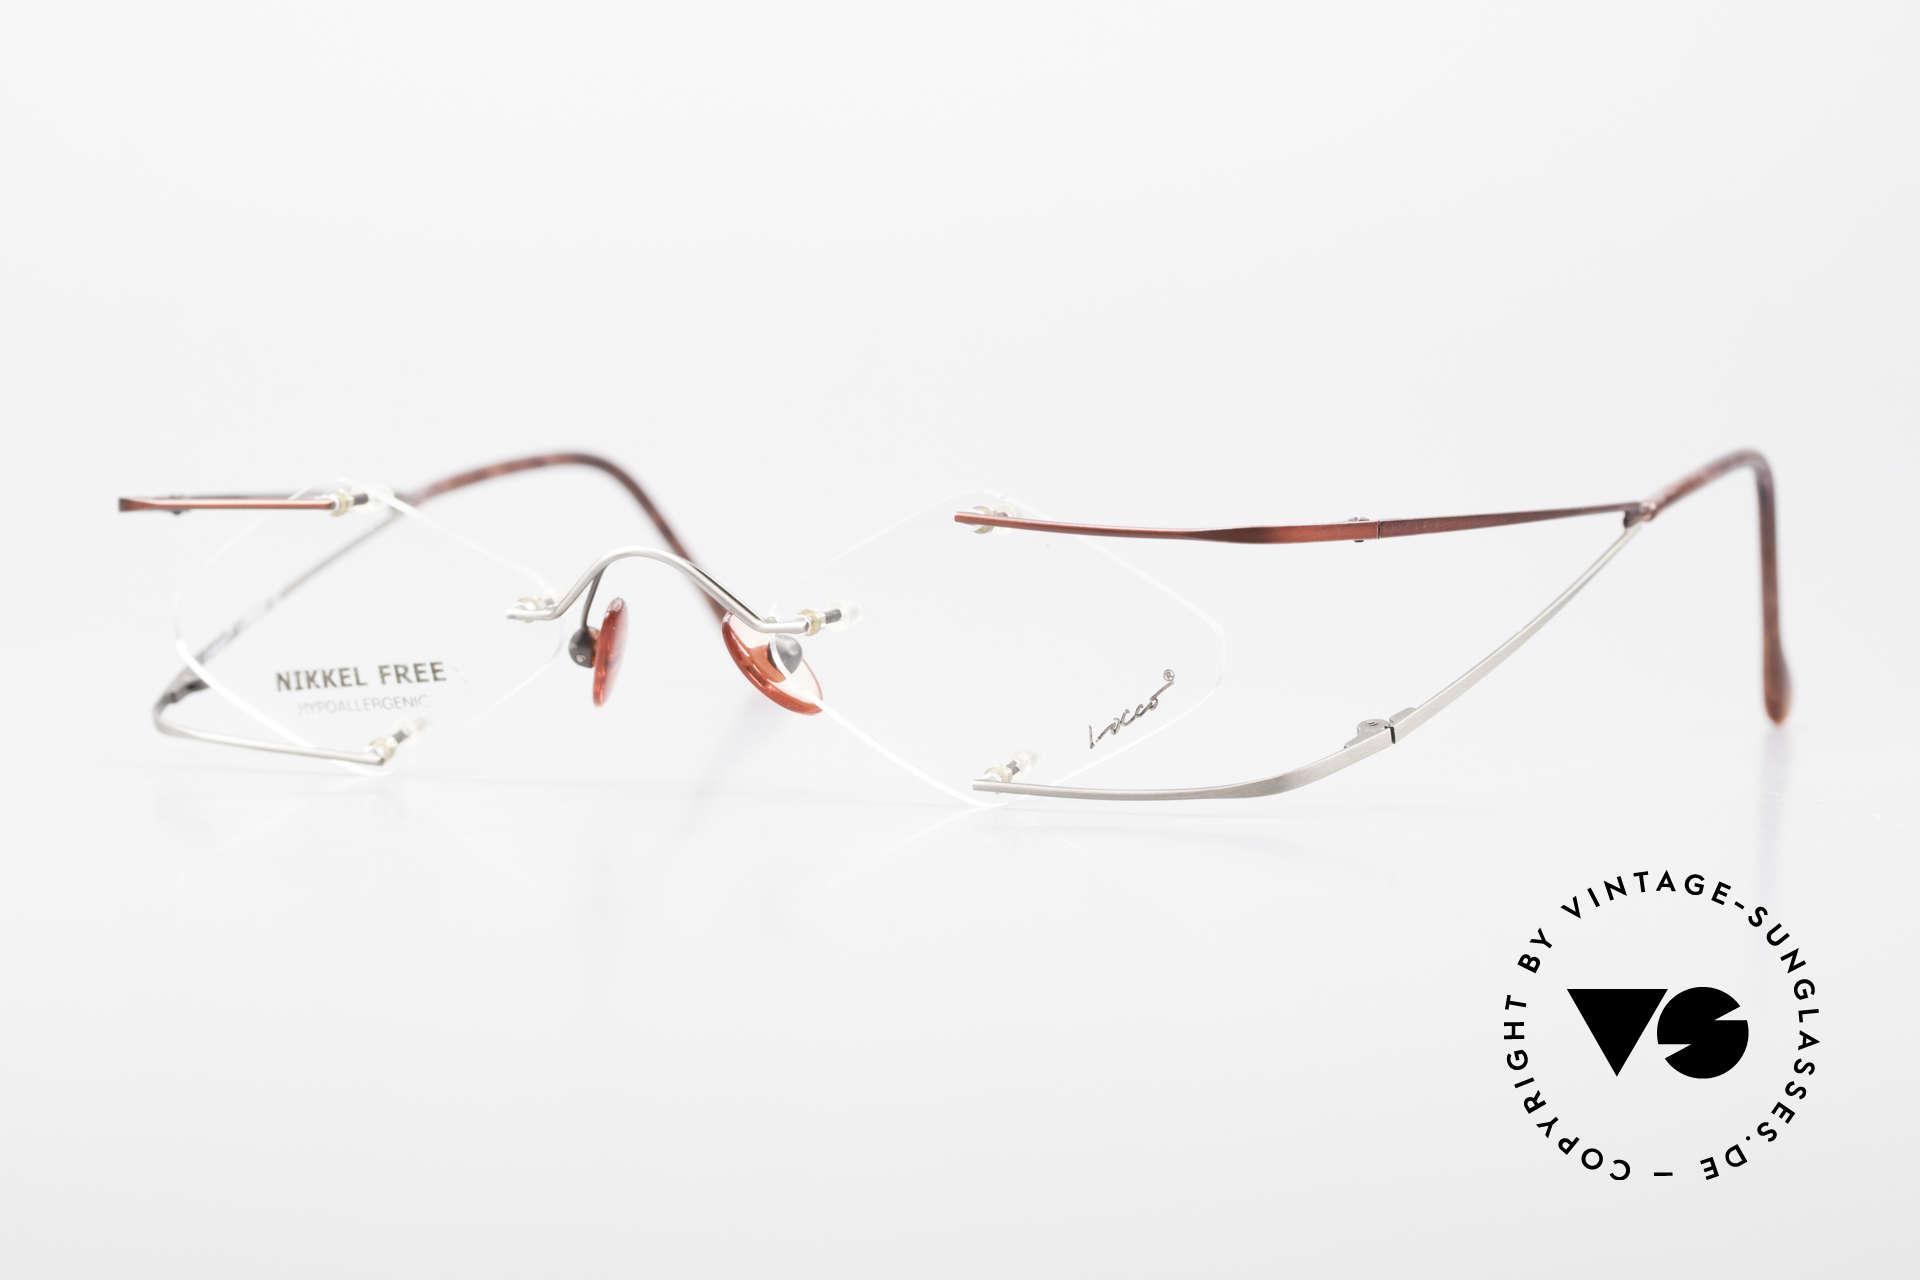 Locco Stars A Extraordinary 90's Eyeglasses, Locco Stars 45-20, crazy rimless 1990's eyeglasses, Made for Men and Women